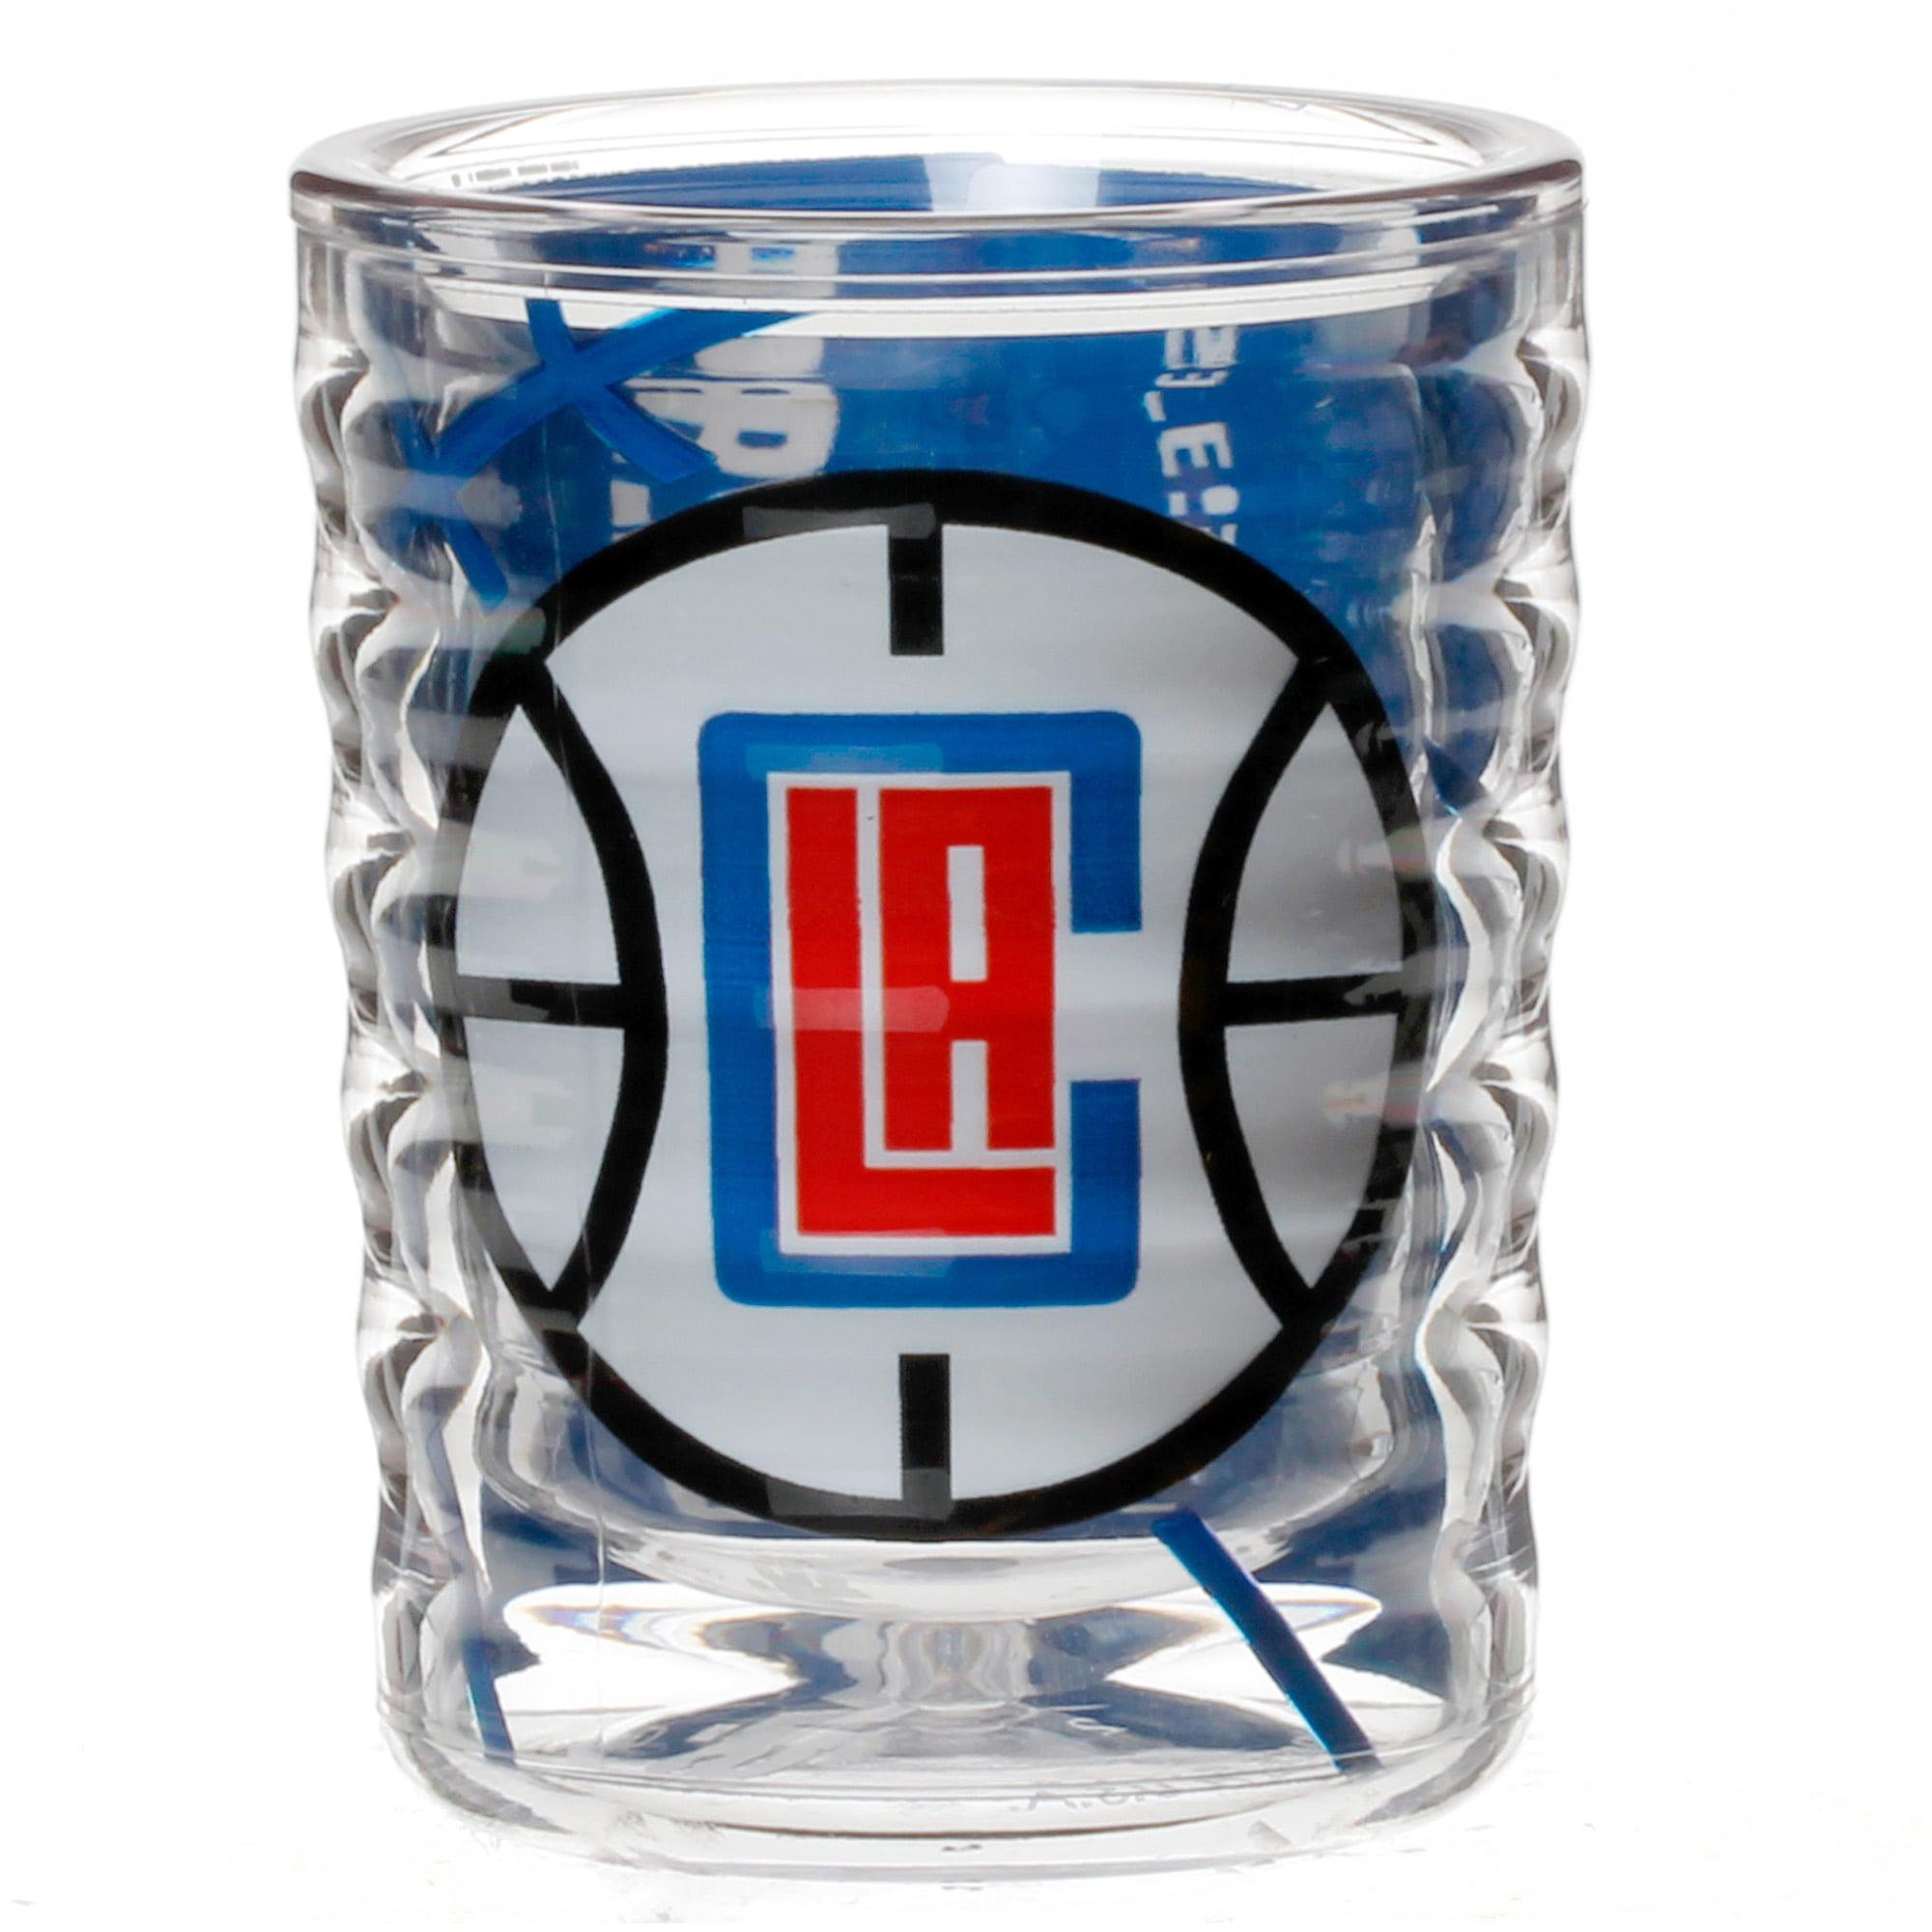 LA Clippers Tervis Tumbler 2.5oz. Collectible Tumbler - No Size